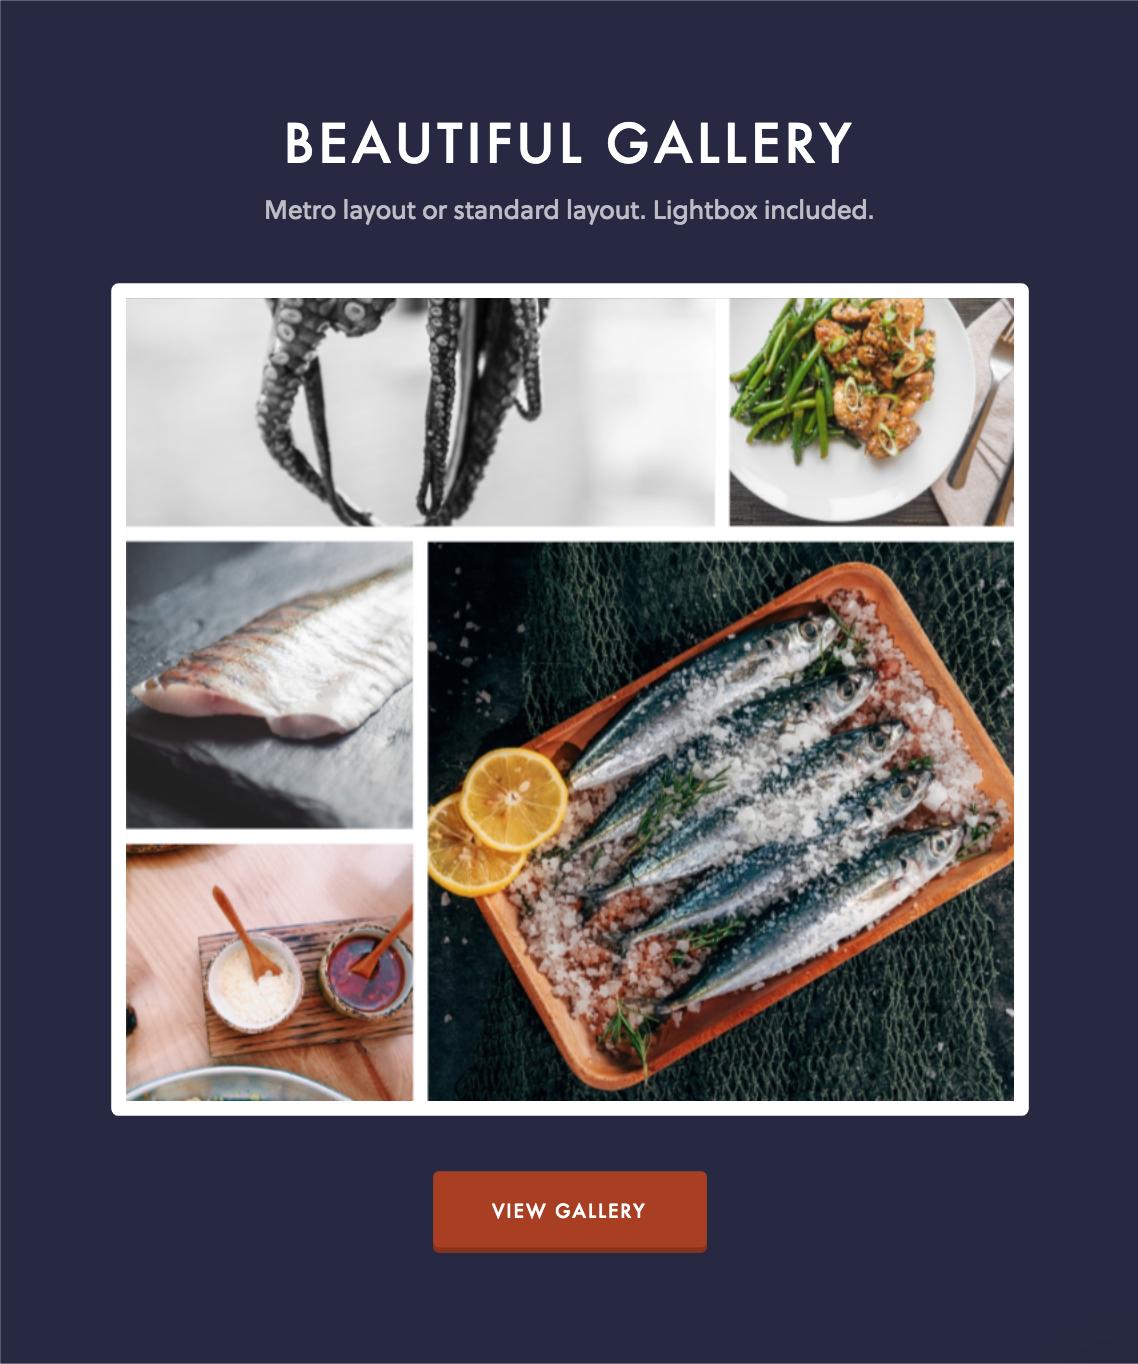 dine gallery - Dine - Elegant Restaurant WordPress Theme